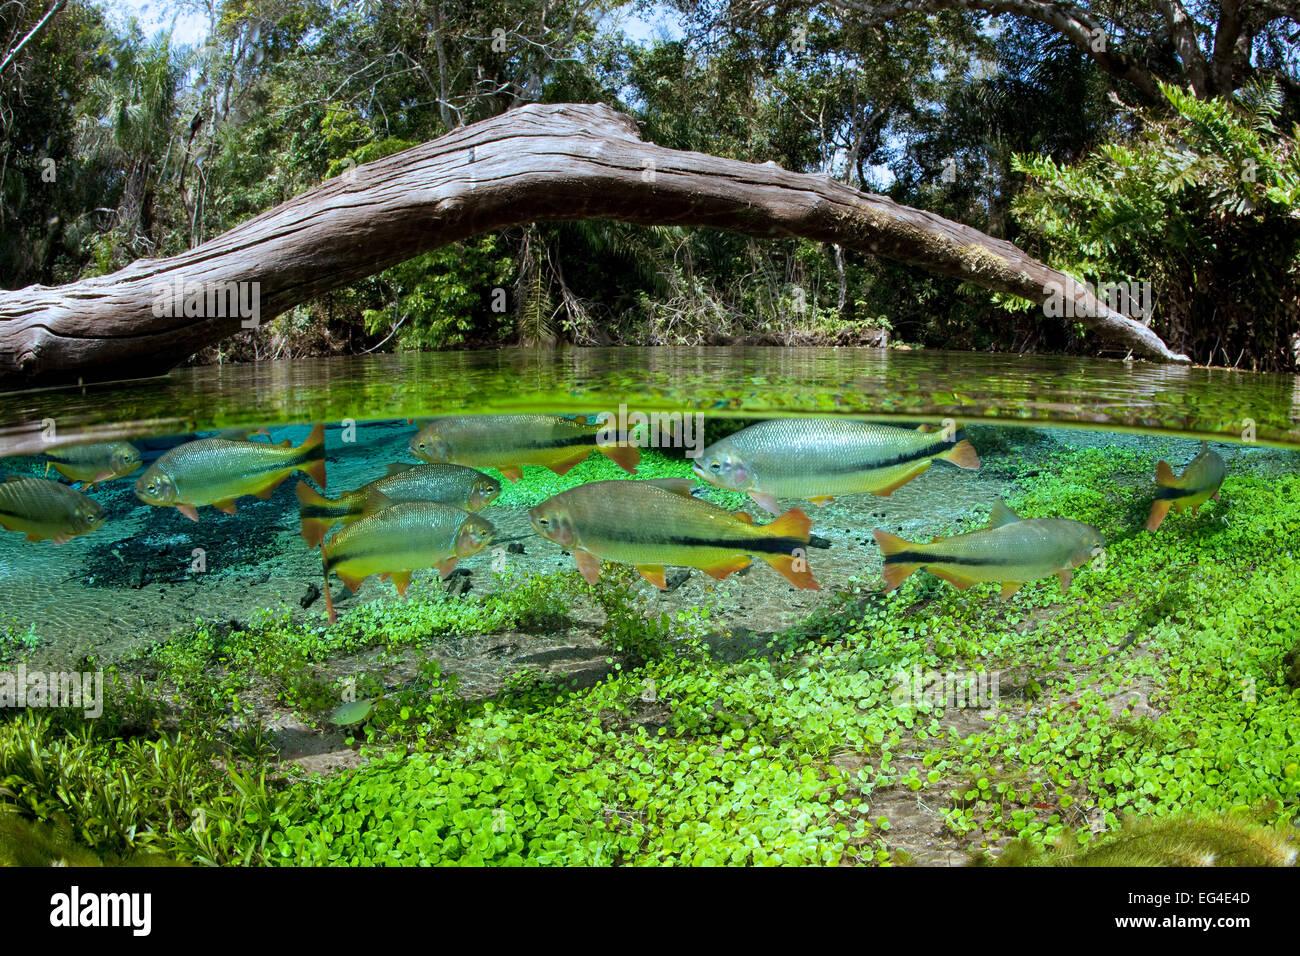 Piraputanga fish brycon hilarii split level in the main for Fish on main